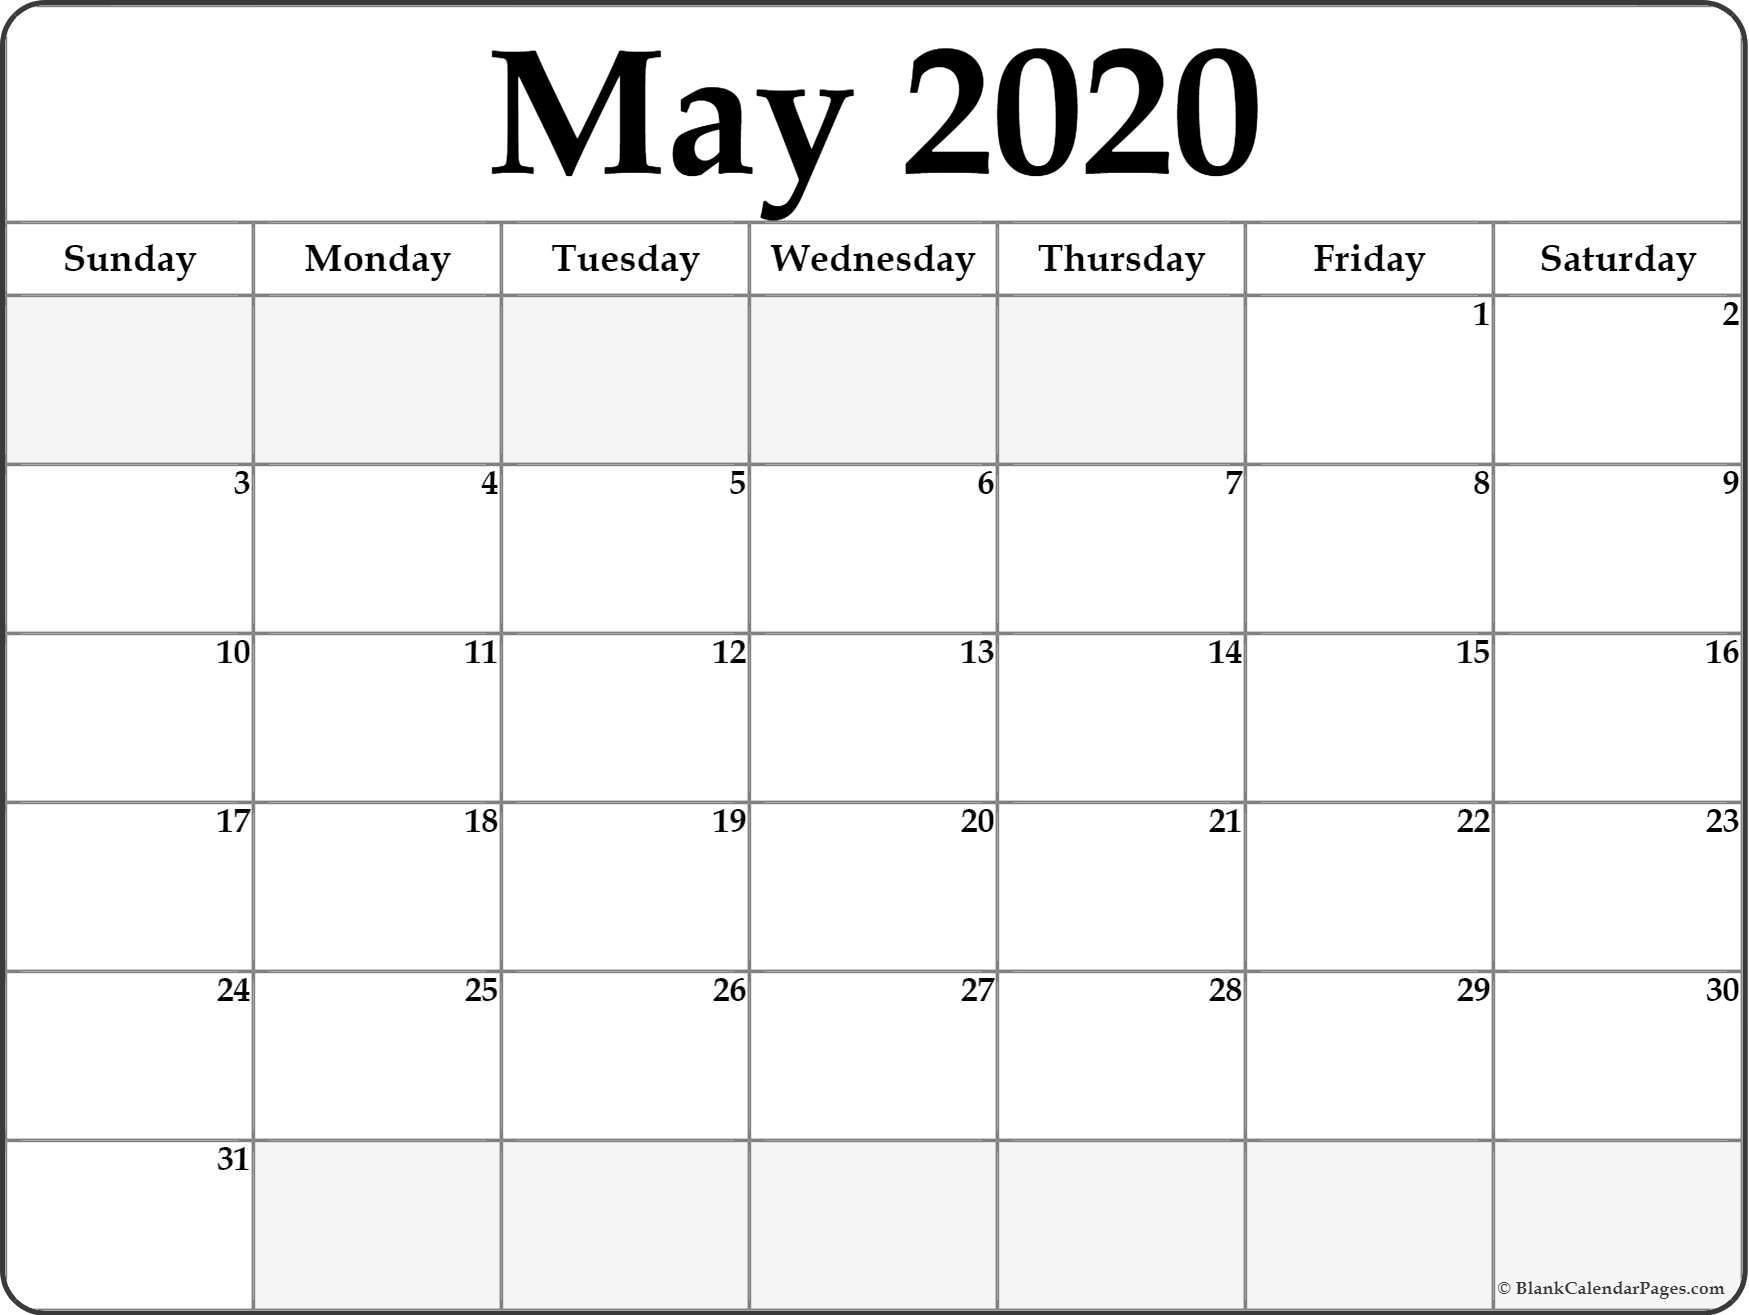 Calendar May 2020 Template Google » Creative Calendar Ideas